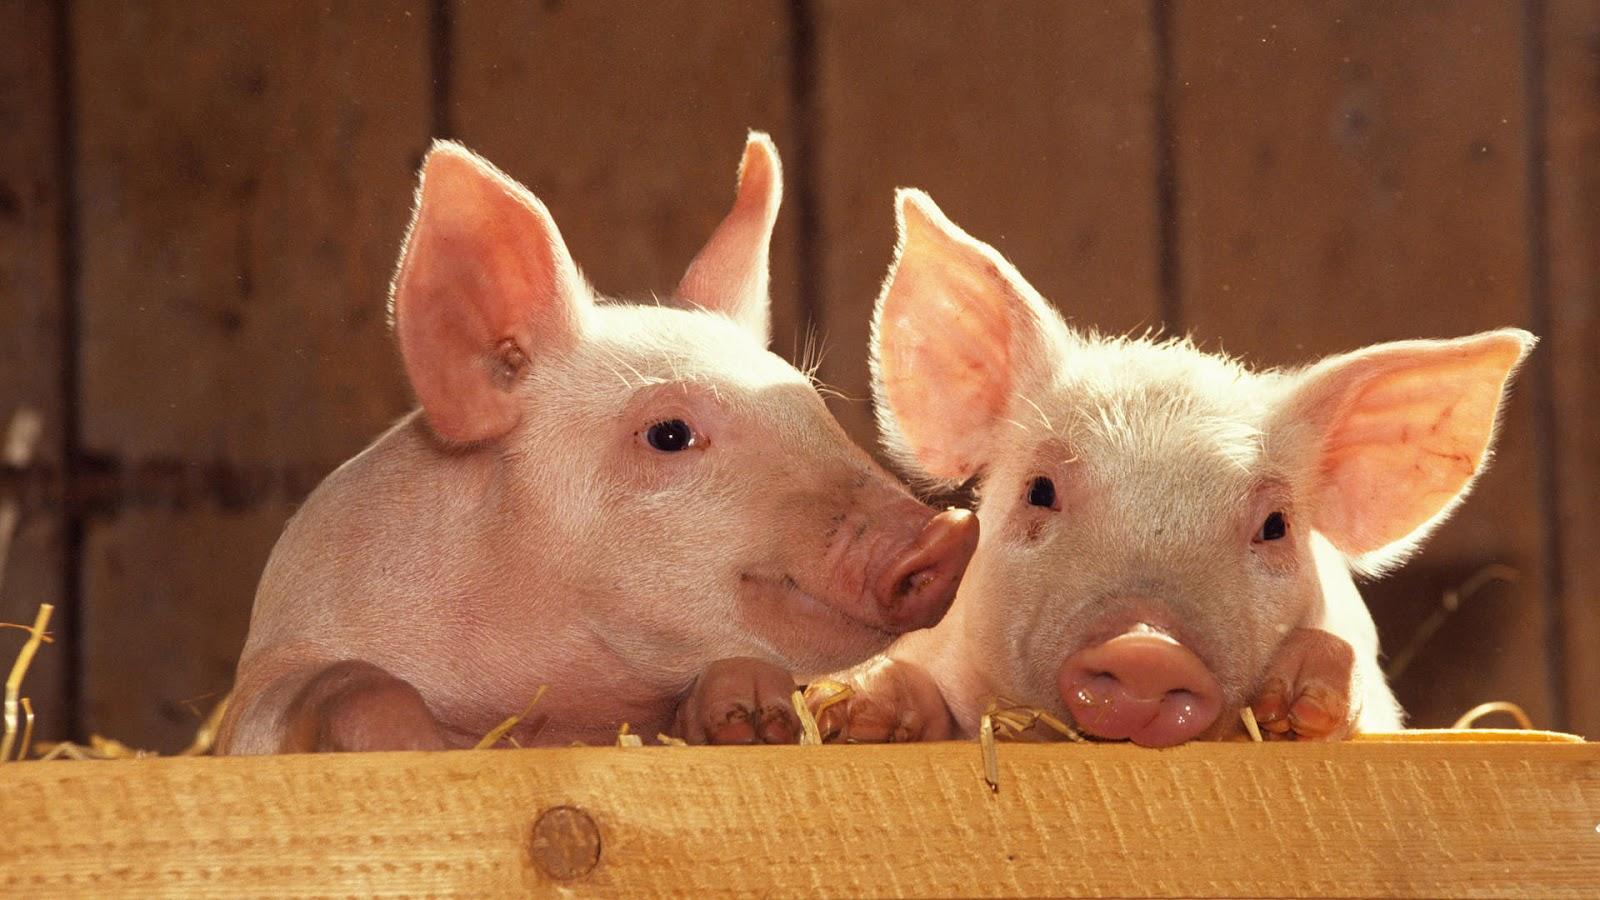 HD animal wallpaper of two cute looking pigs HD pig wallpaper 1600x900